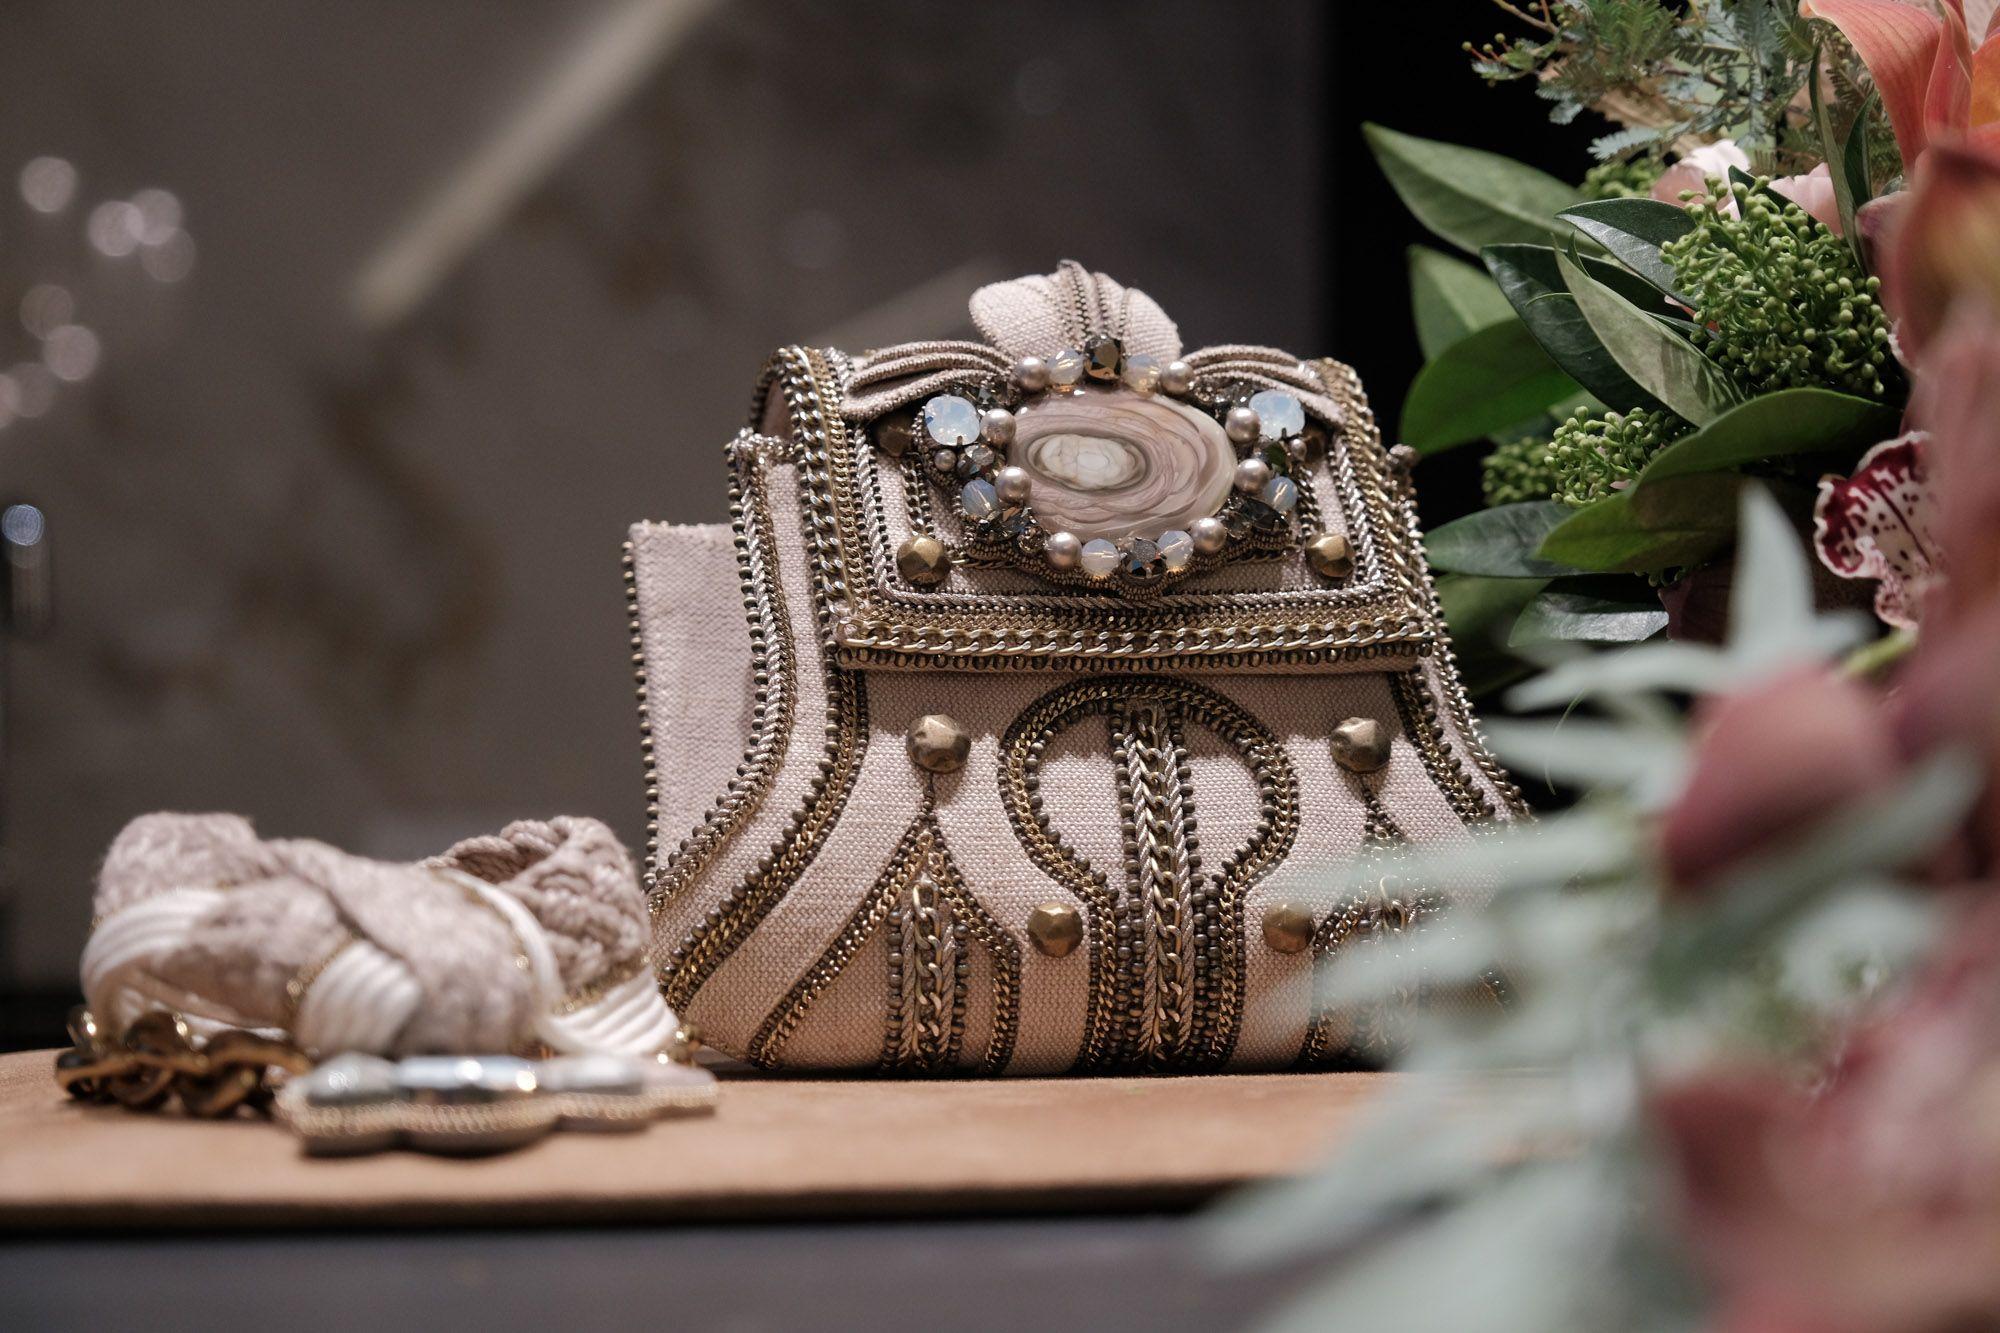 Aurelia Residences and Designer Bea Valdes Celebrate Filipino Craftsmanship This Christmas 2019